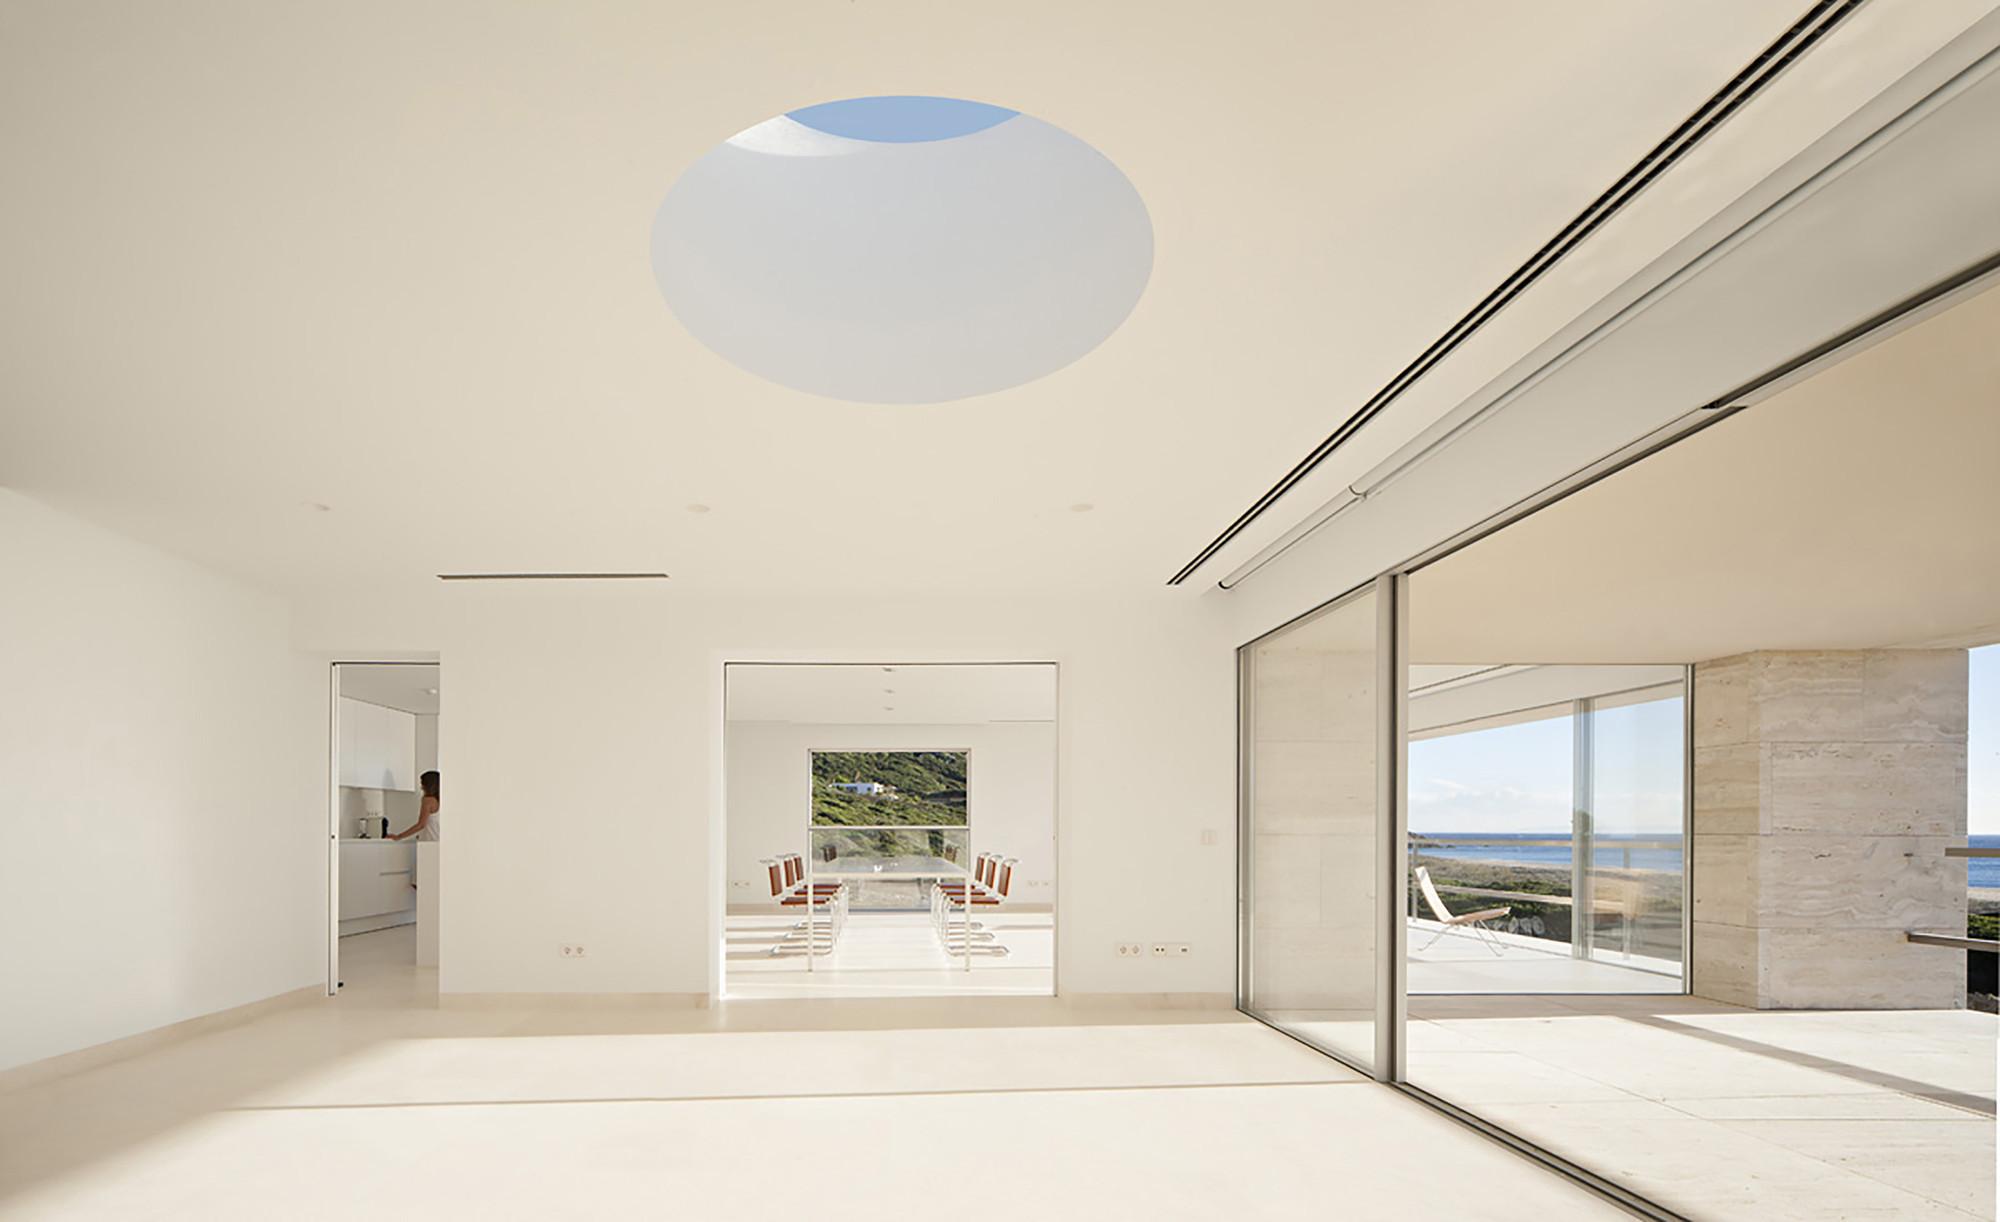 Gallery of the house of the infinite alberto campo baeza 3 - Casa campo baeza ...